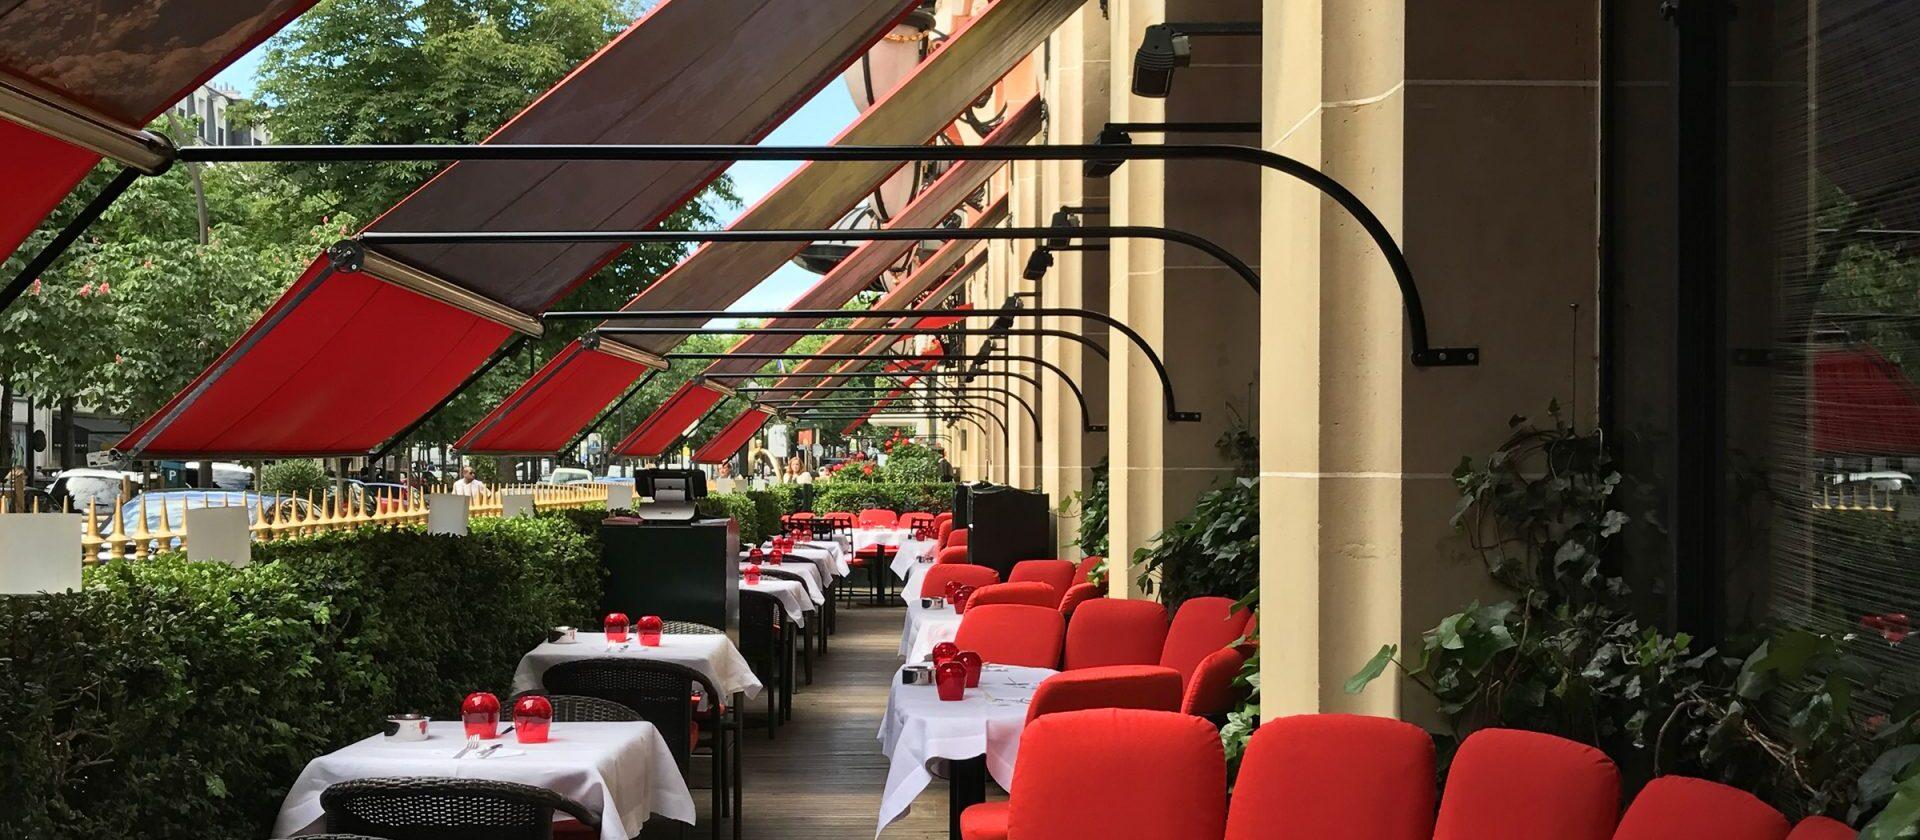 La terrasse montaigne hotel plaza ath n e dorchester collection - Restaurant en terrasse paris ...